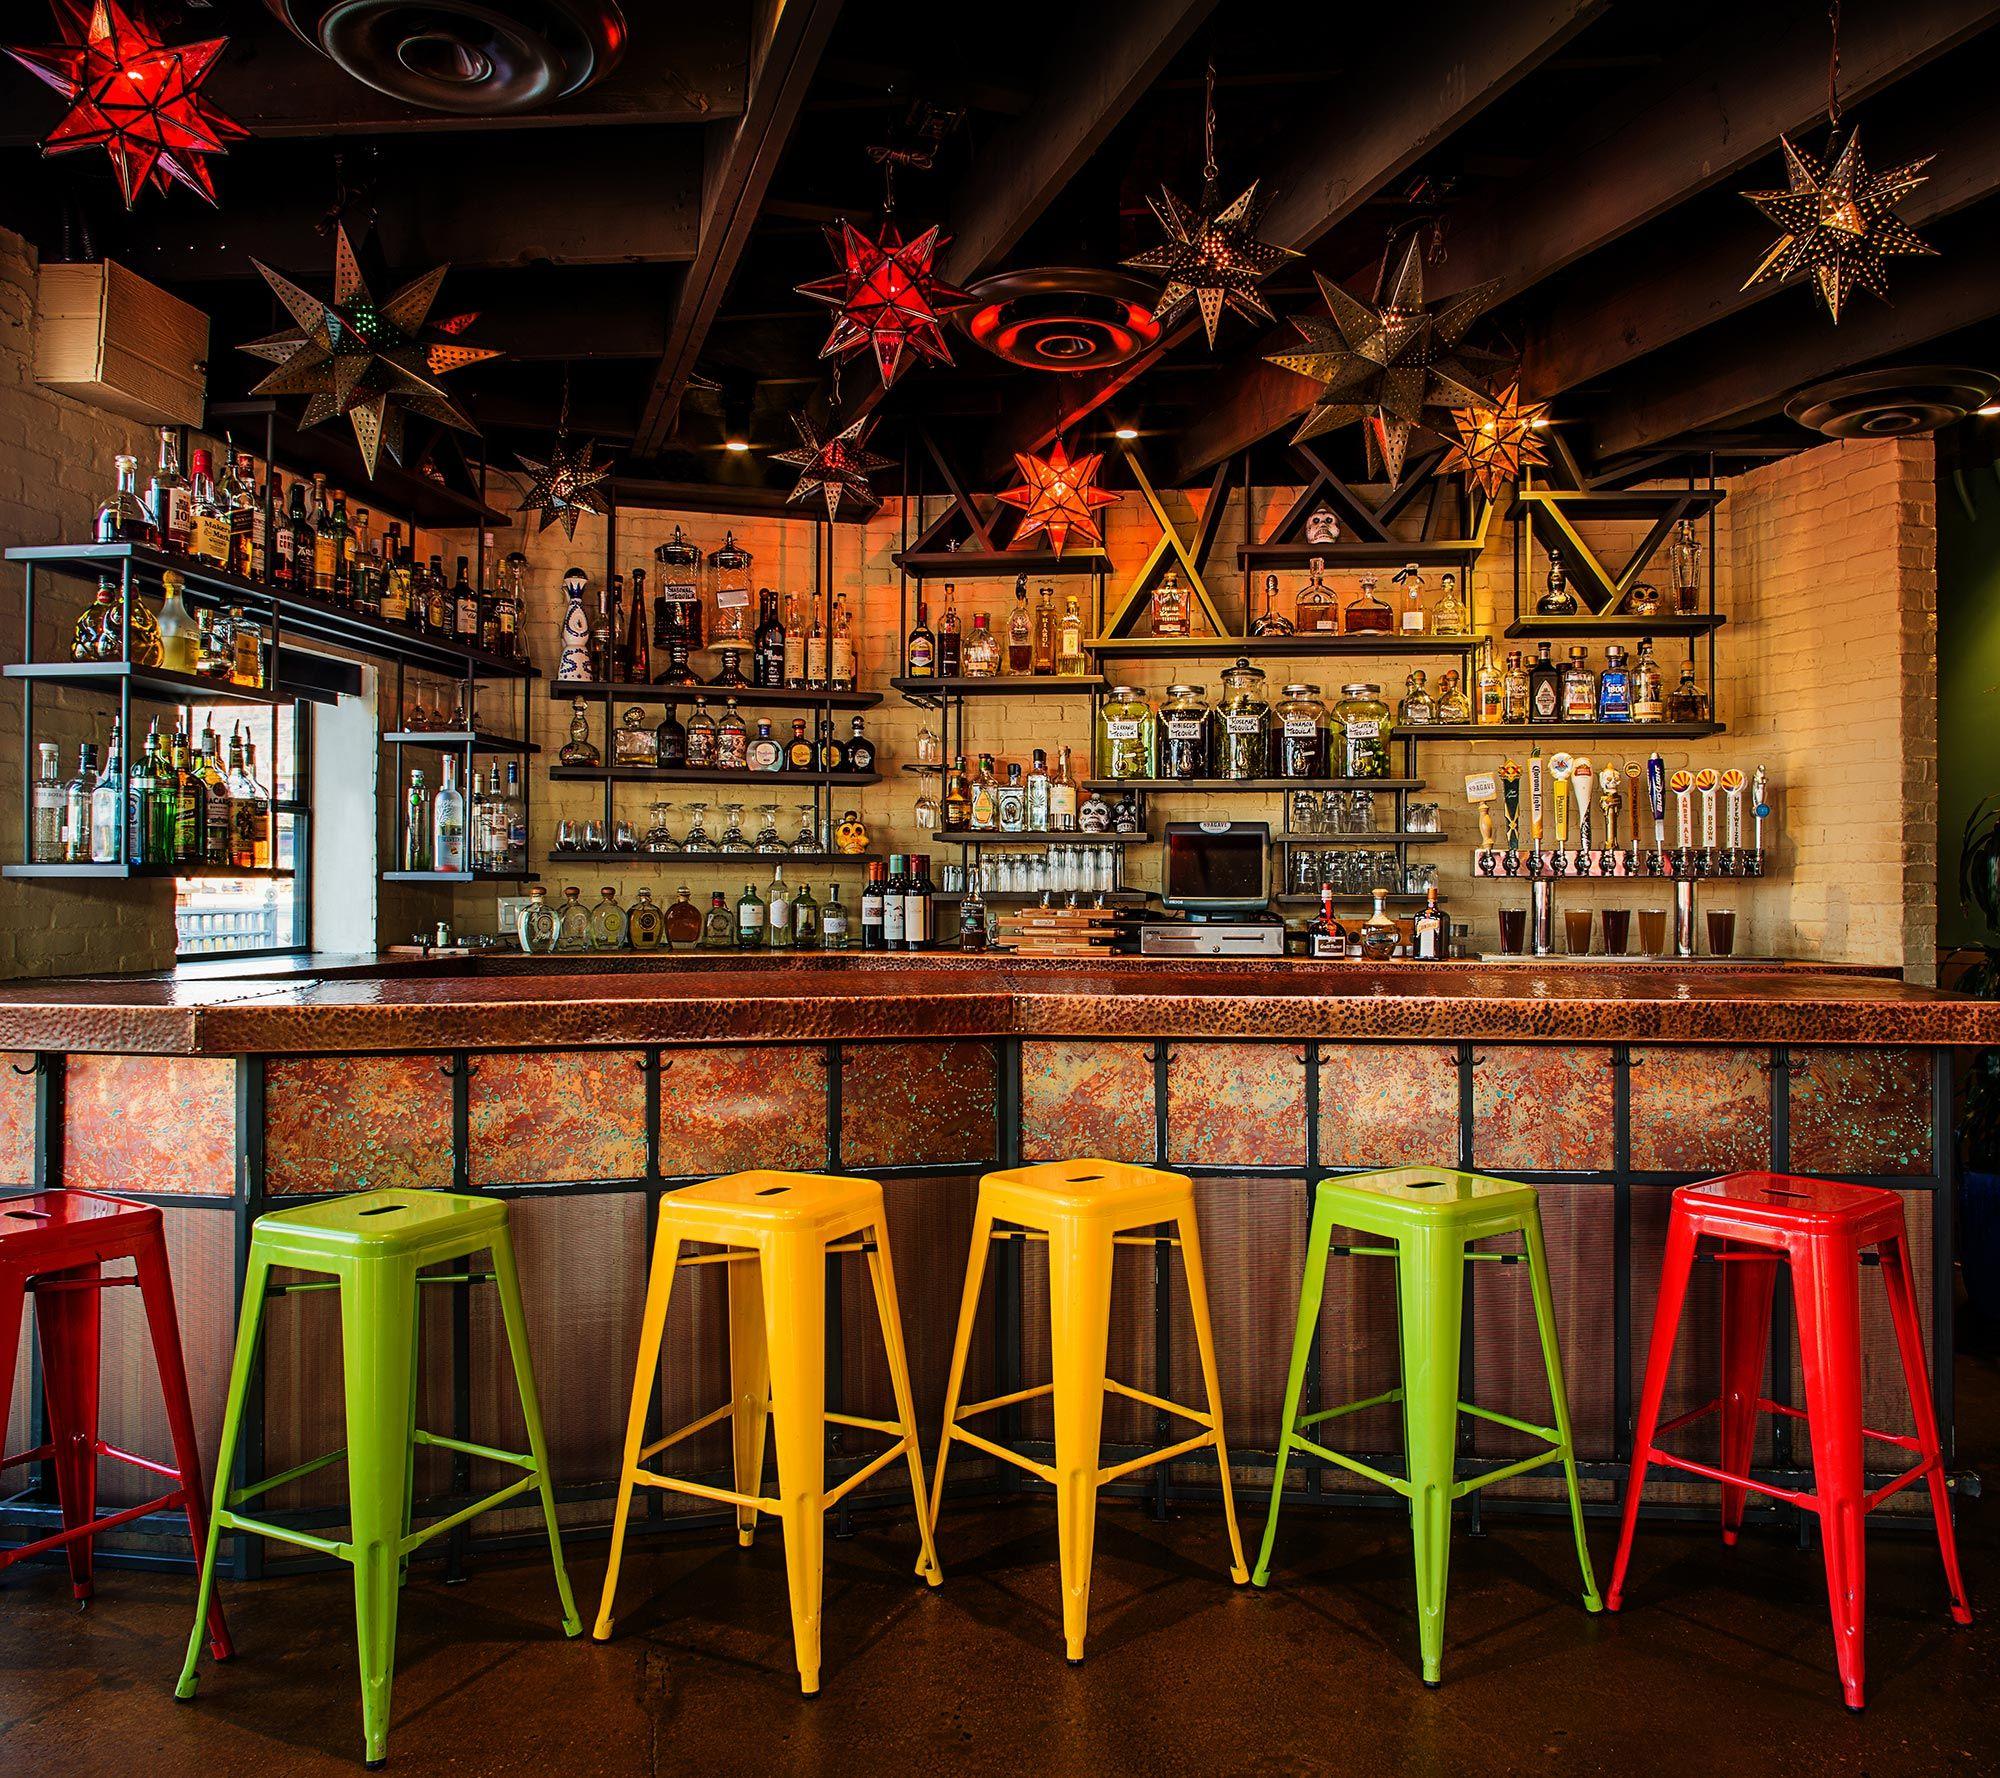 mexico furniture. Mexican Bar Mexico Furniture